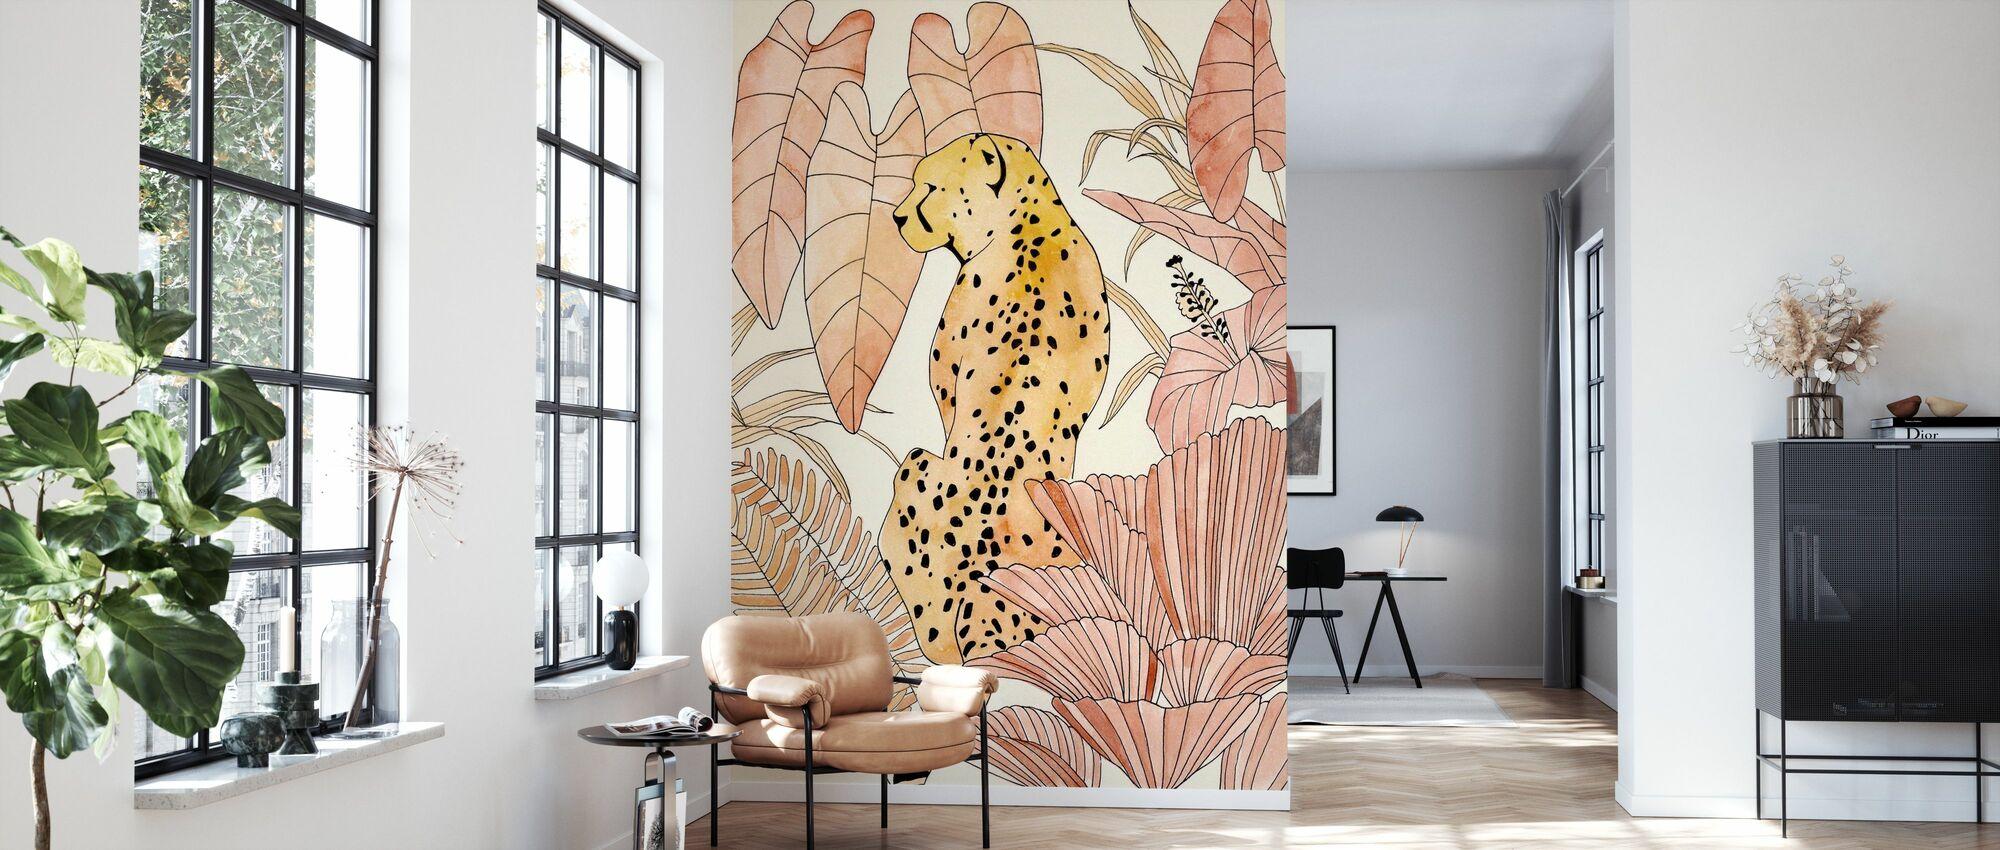 Blush Cheetah - Wallpaper - Living Room